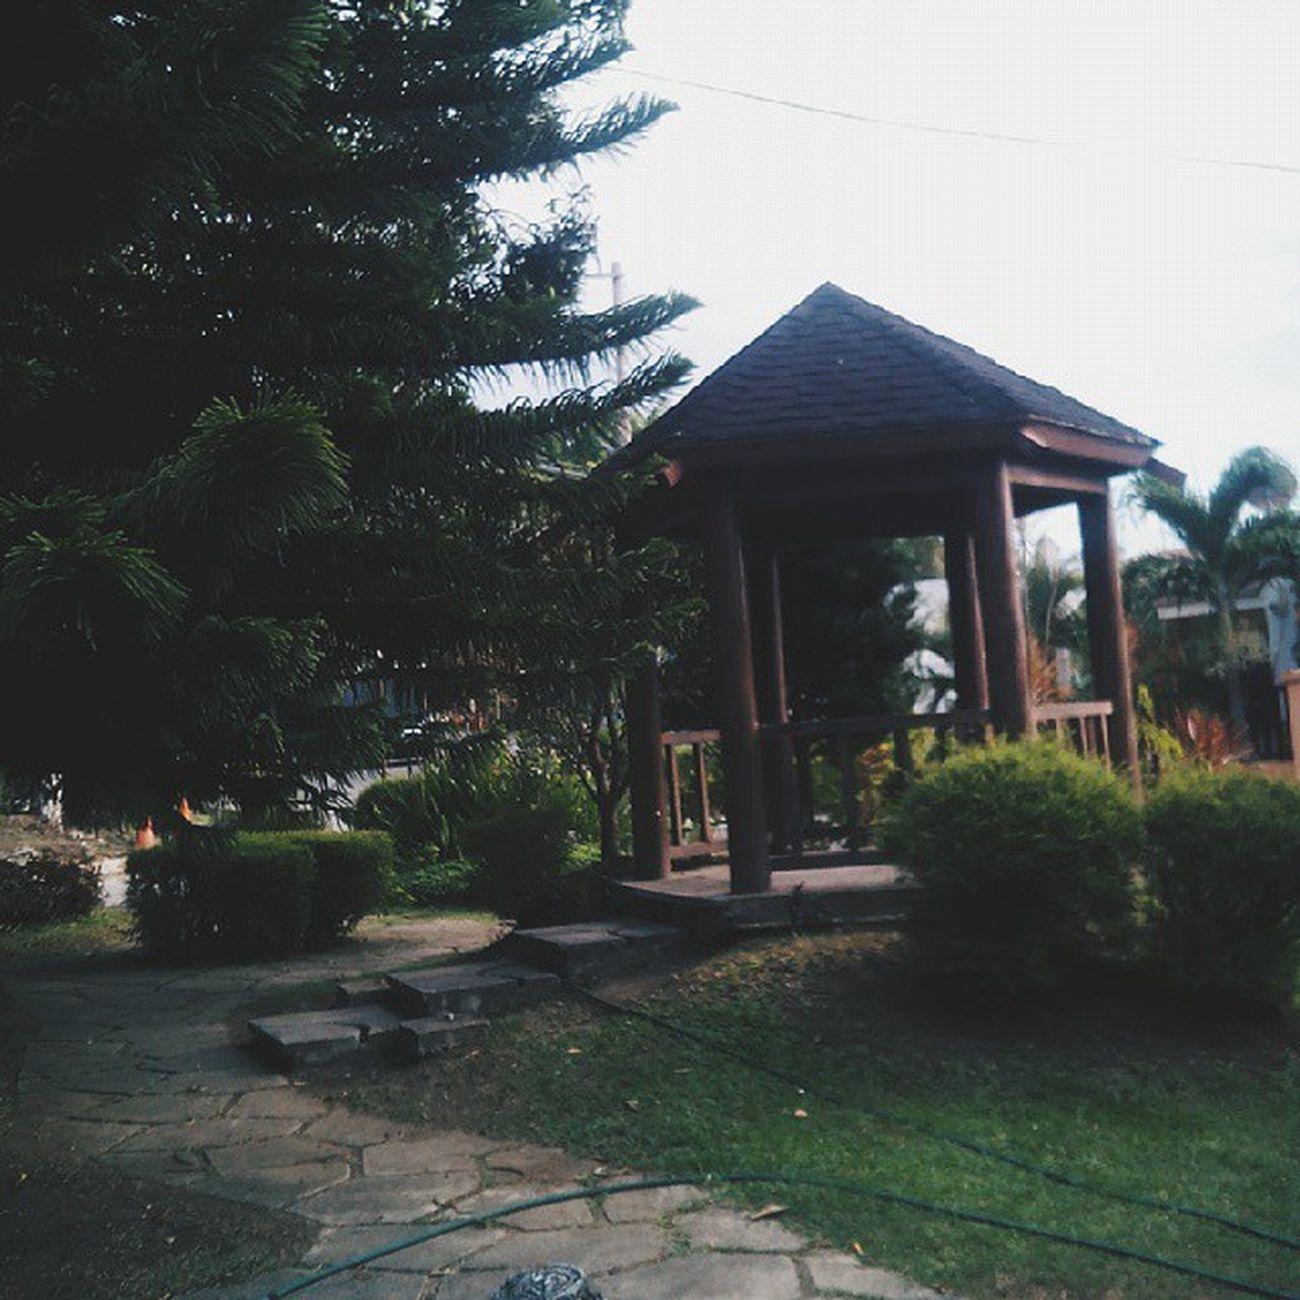 Vscocam VSCO Cottage Parkspring parkspringvillage sanpedrolaguna love life vscoph vsvogang ph chill